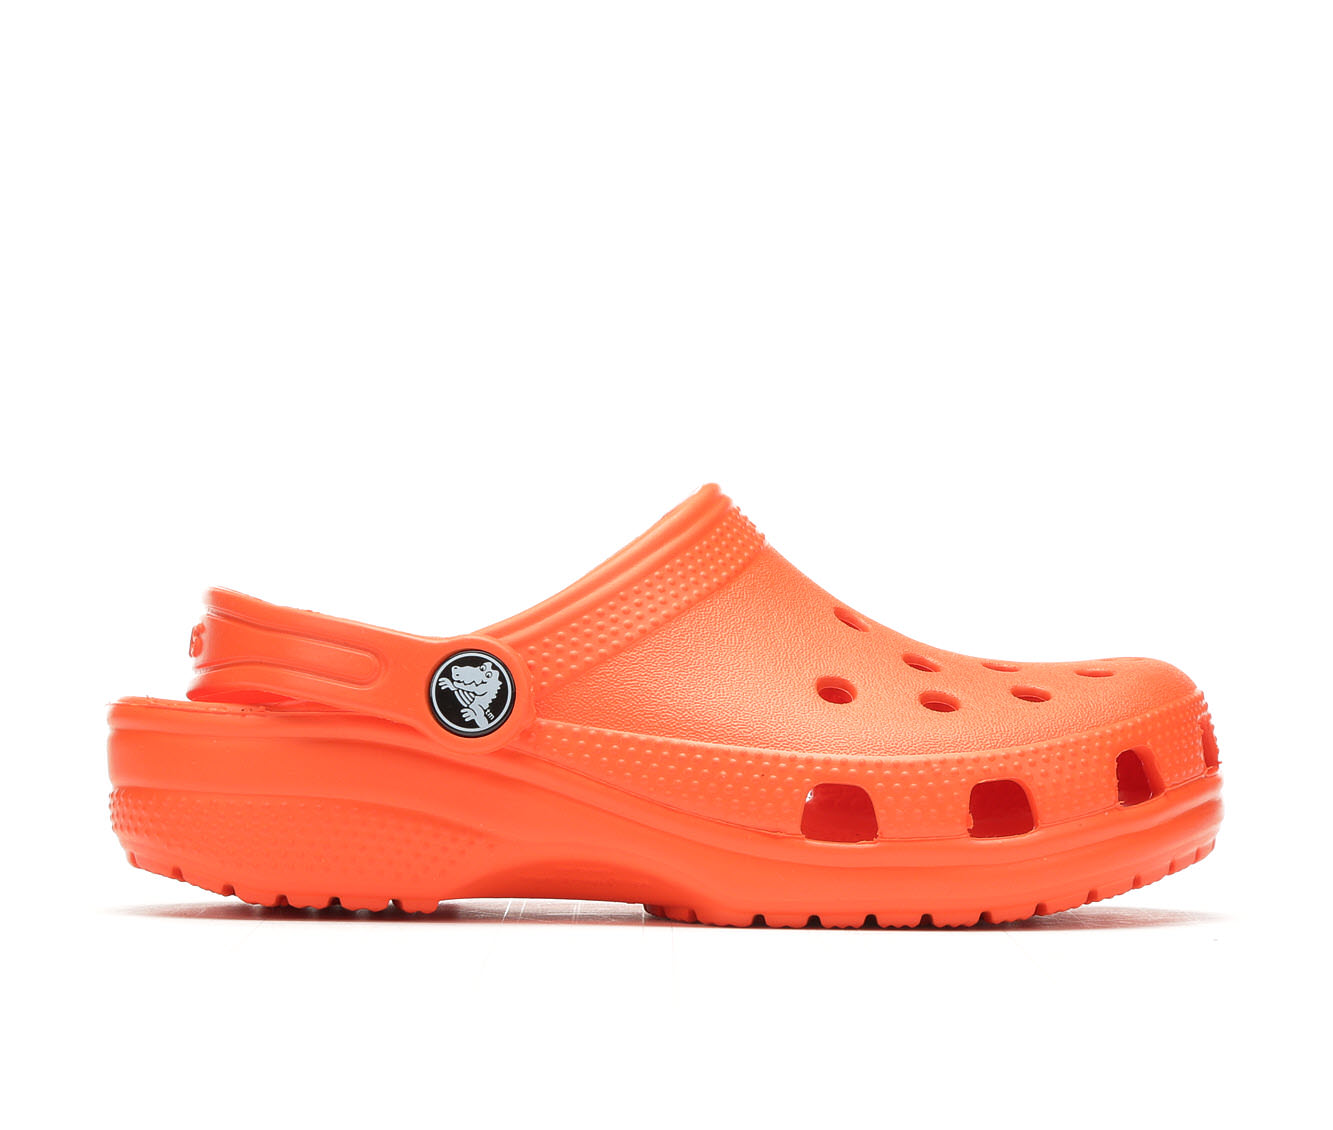 Girls' Crocs Classic Clog Children's Shoes (Orange)